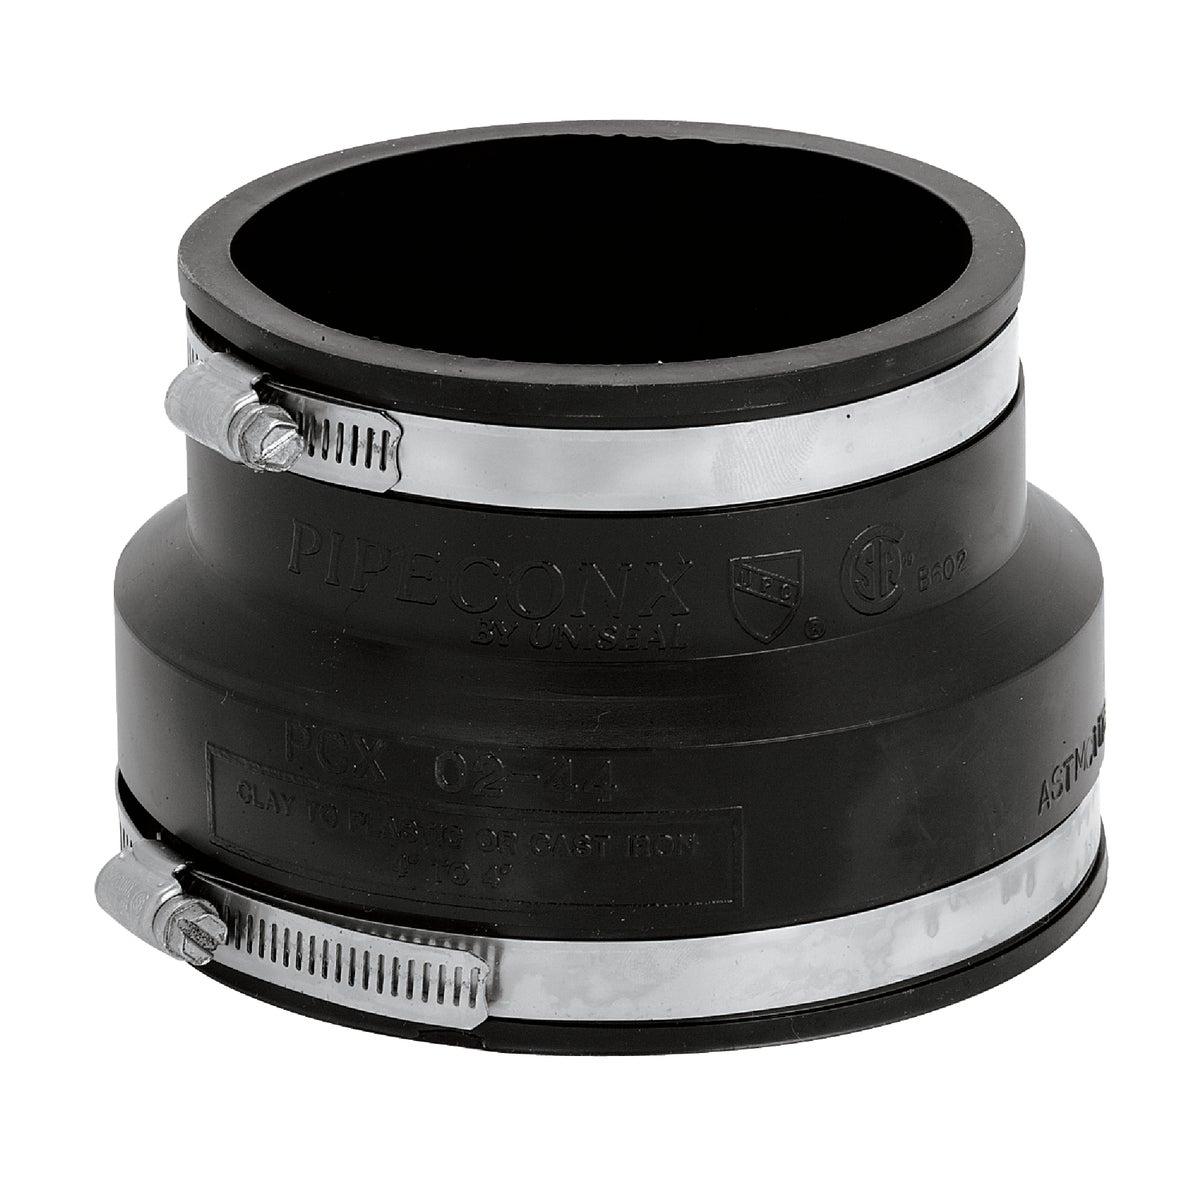 4CLAYX4PVC FLEX COUPLING - P1002-44 by Fernco Inc